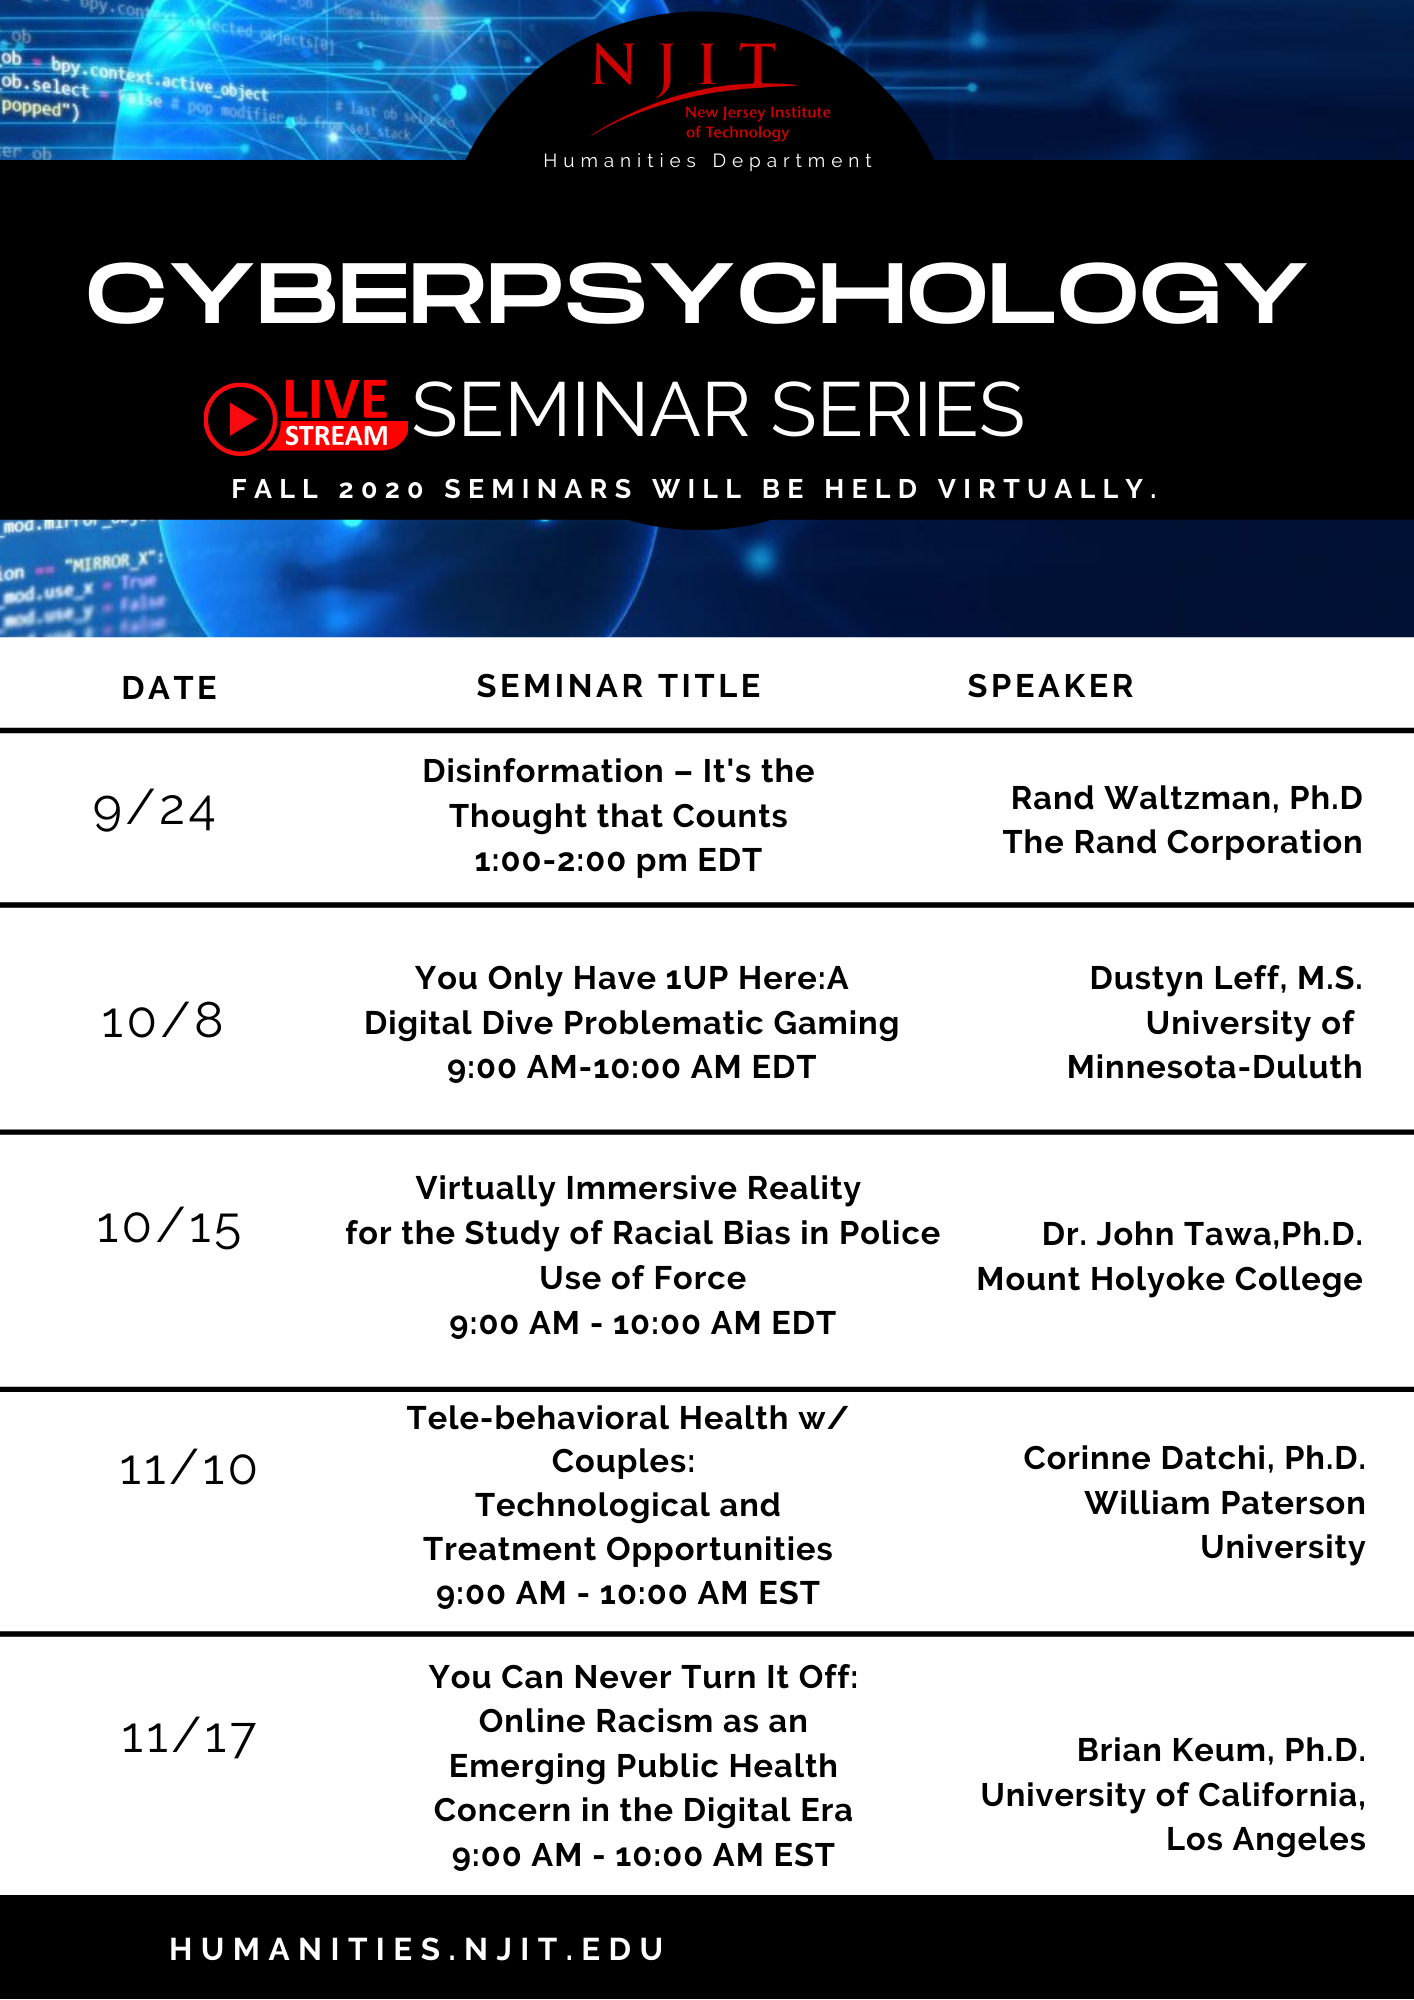 Fall 2020 Cyberpsychology Seminar Series